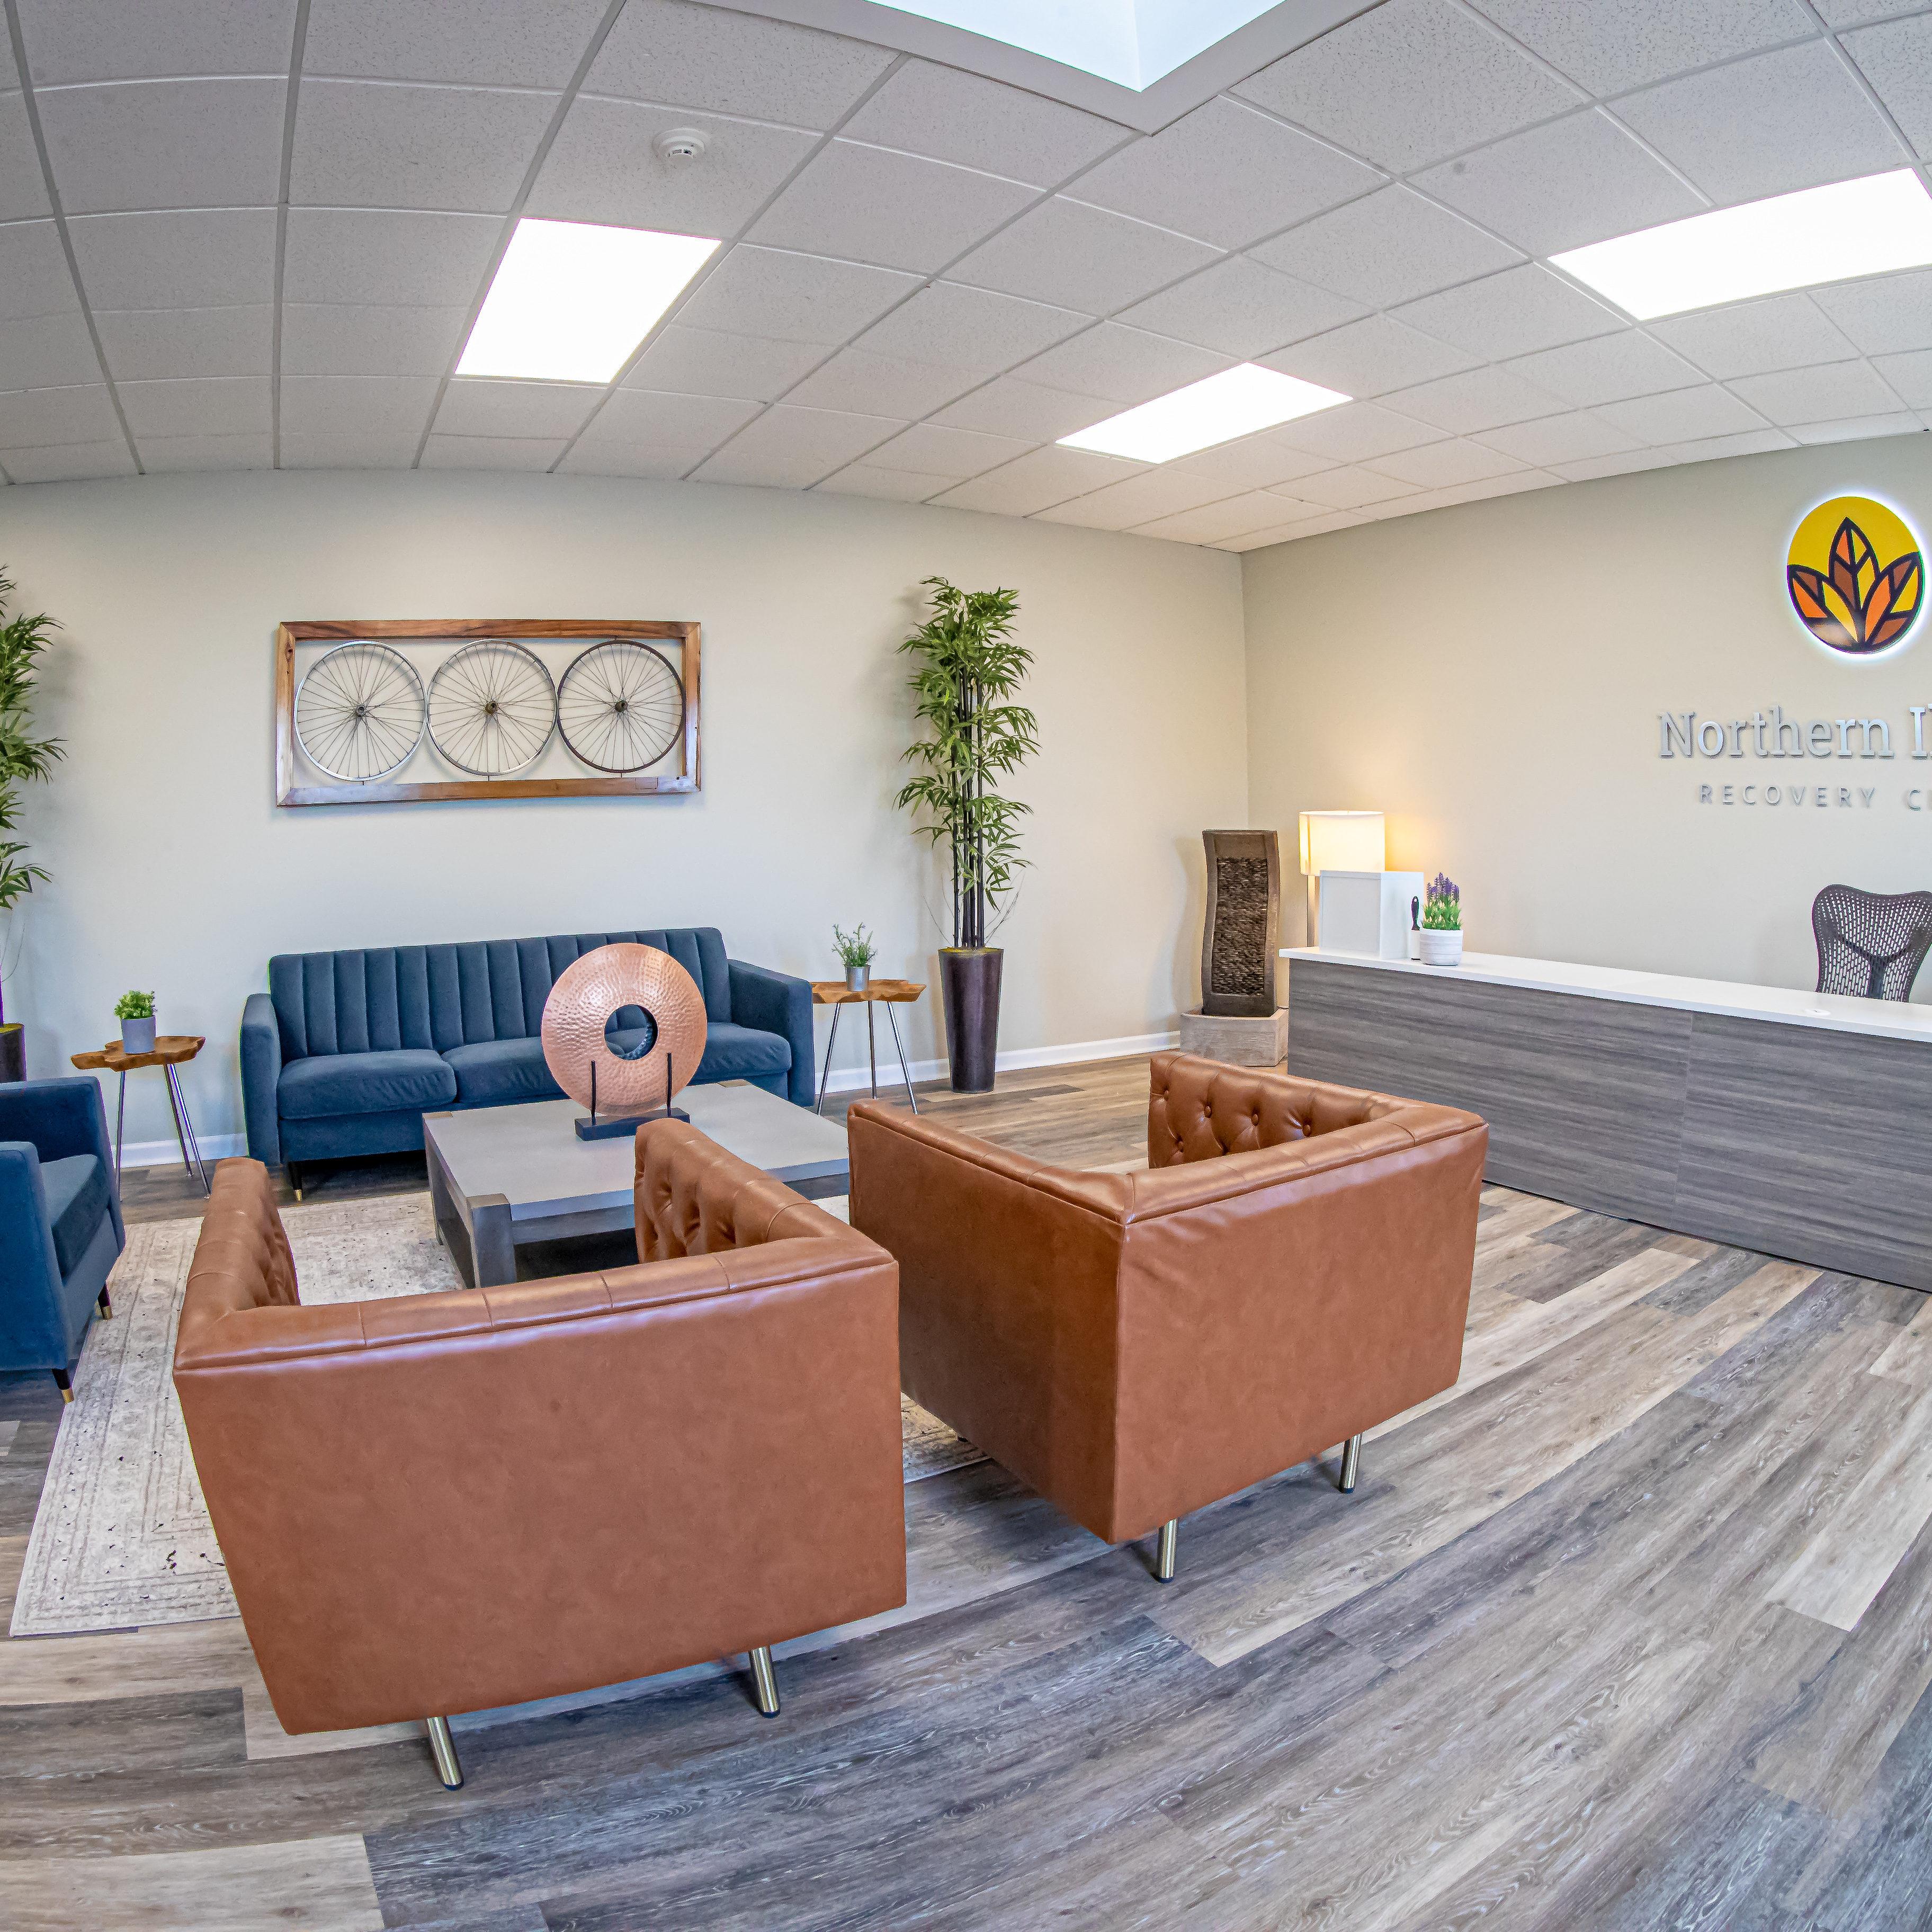 Northern illinois recovery facility lobby